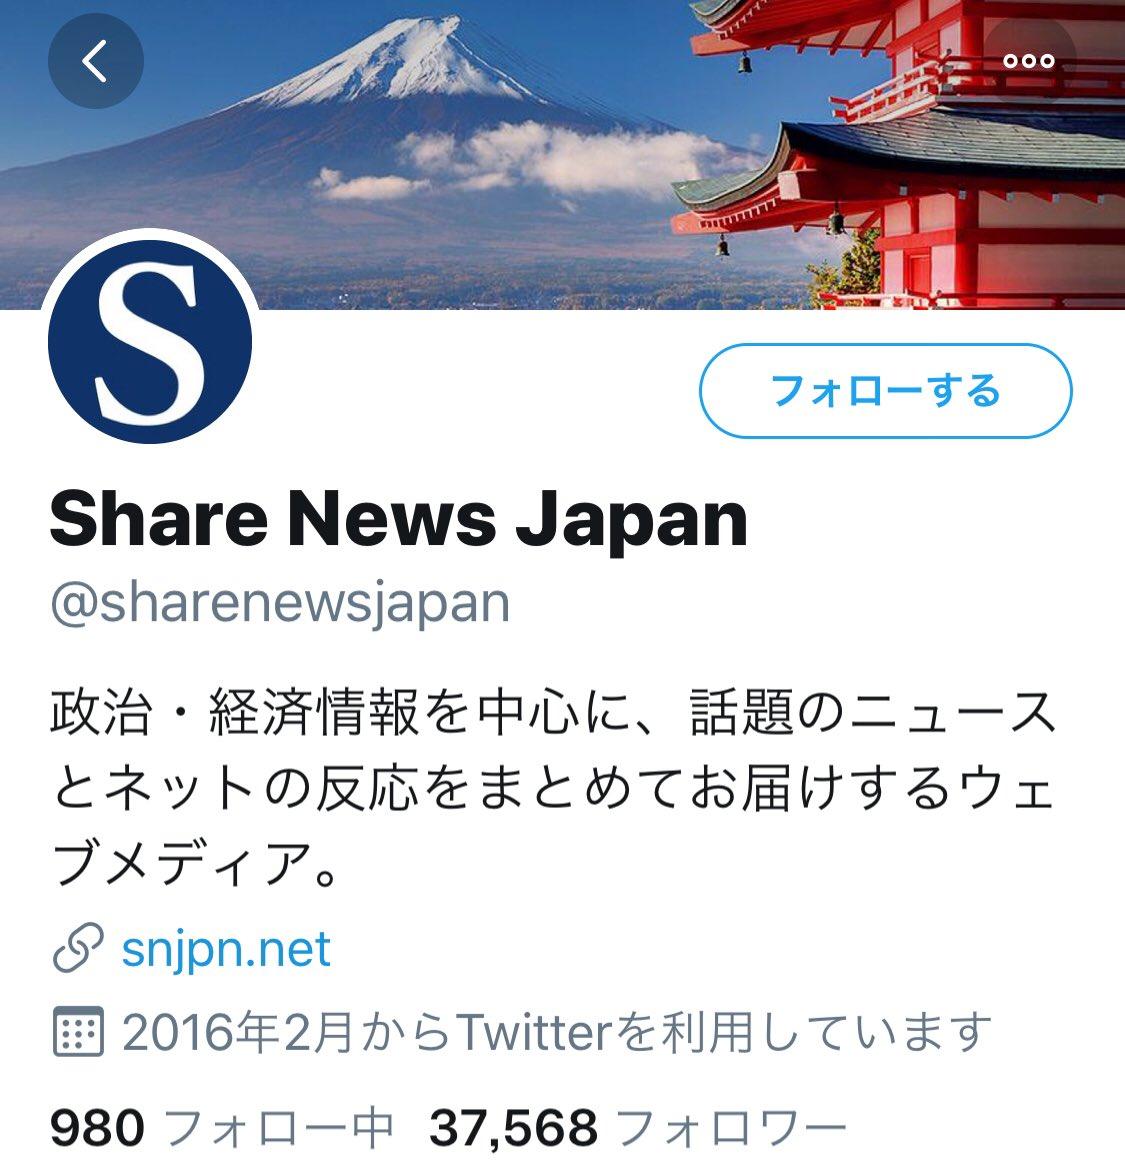 Japan share news